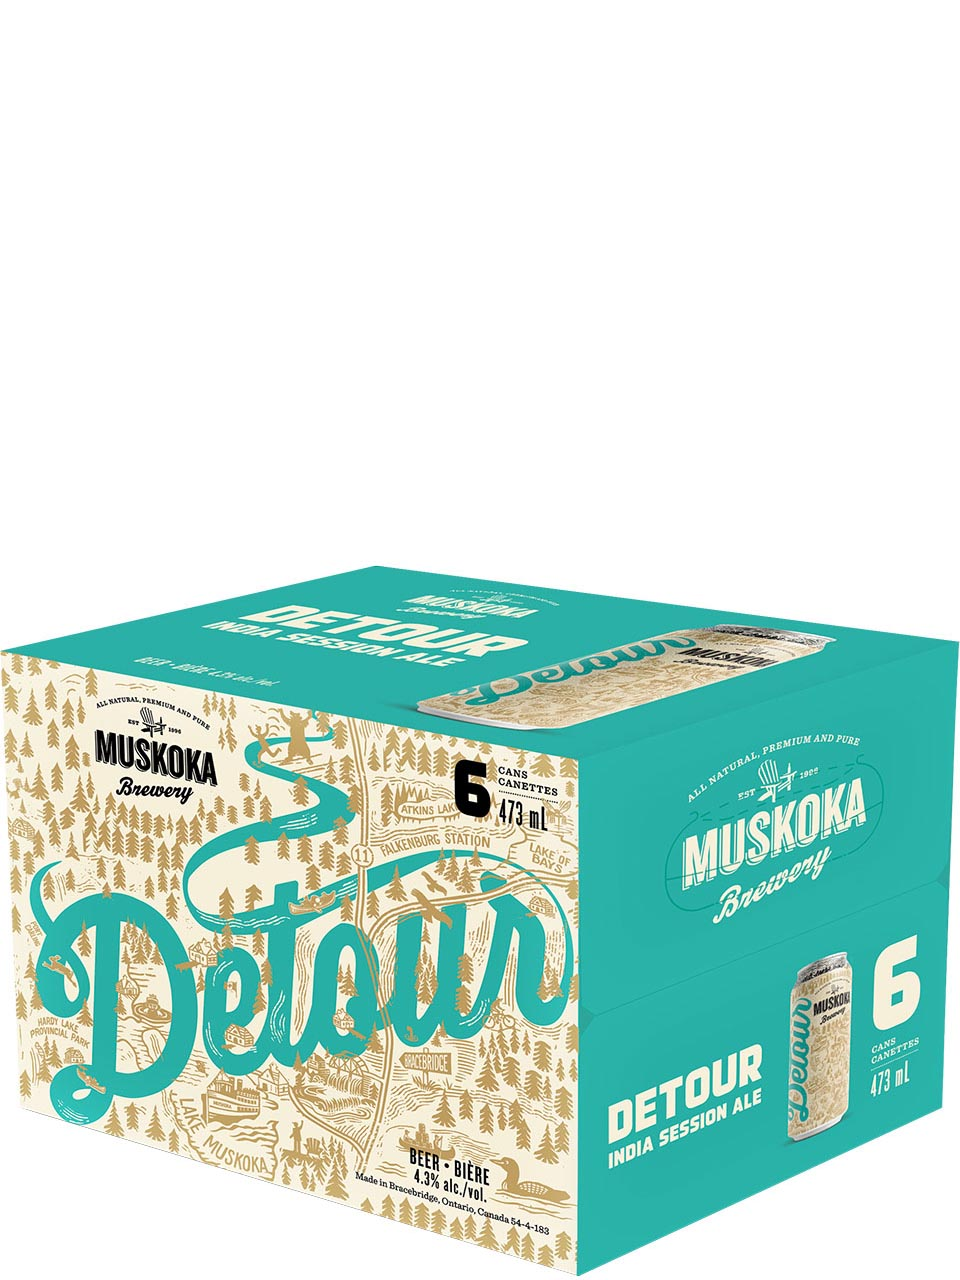 Muskoka Detour IPA 6 Pack Cans